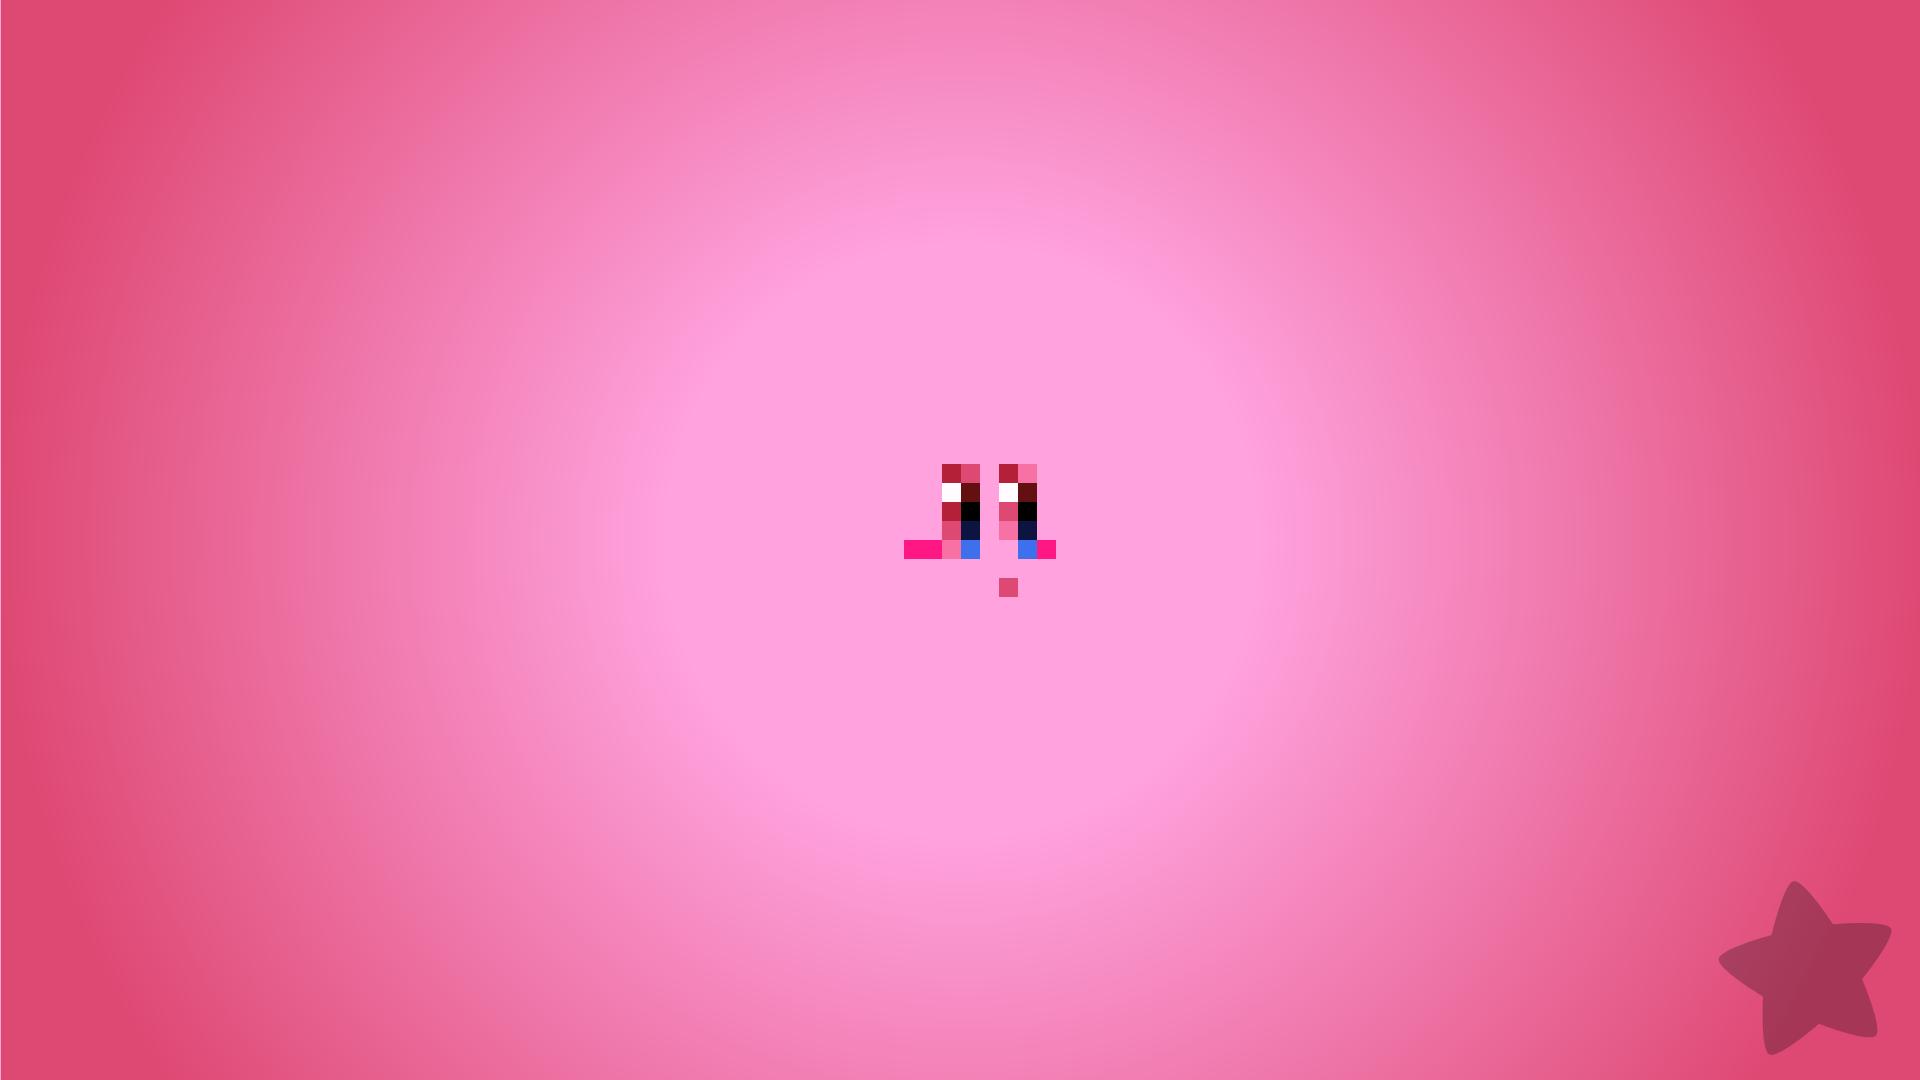 Kirby! [1920x1080]